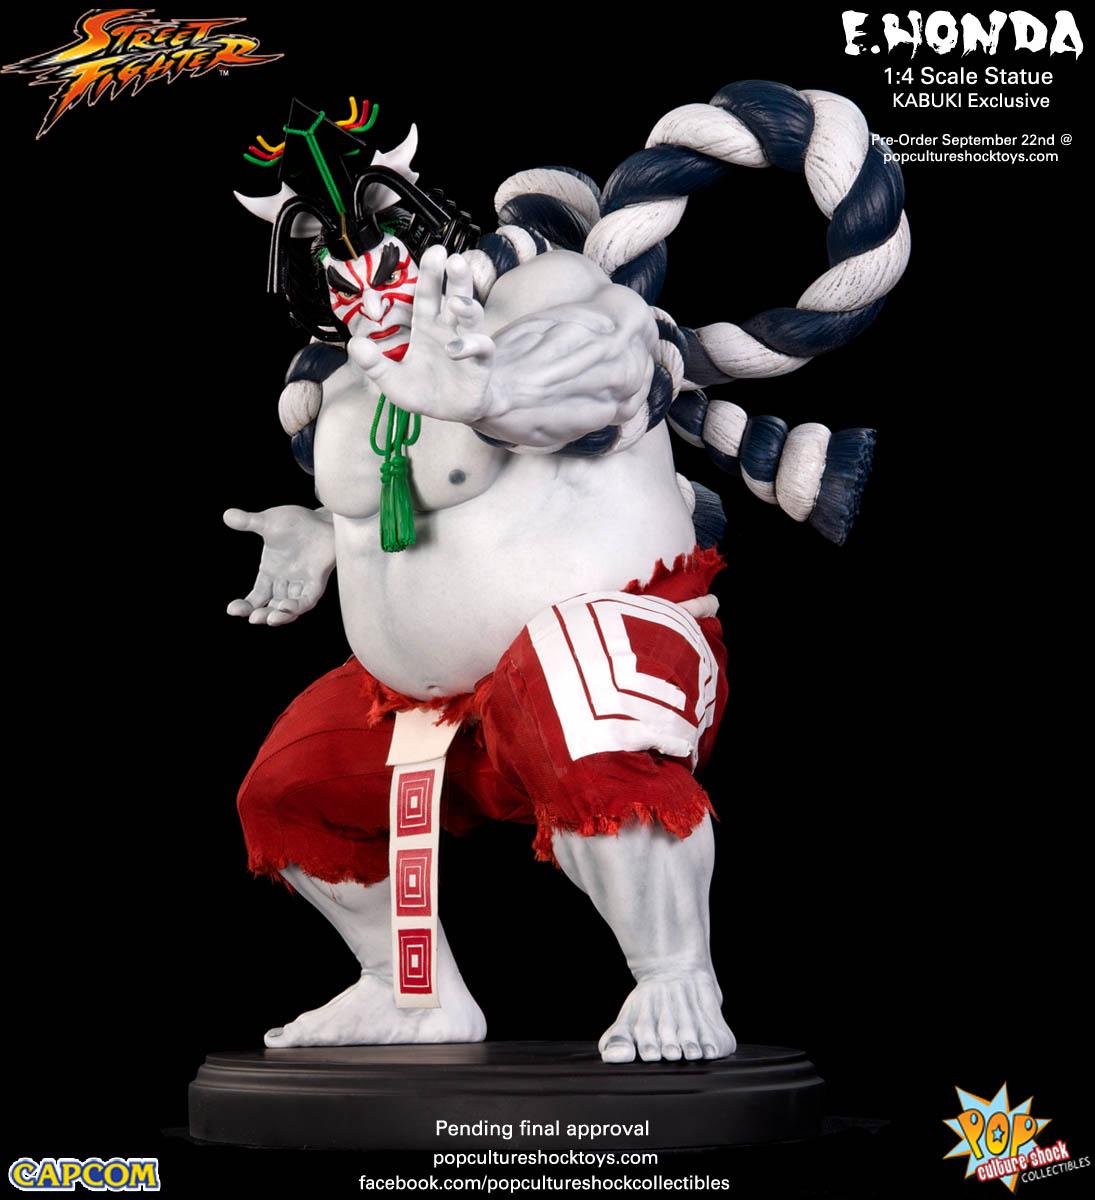 [Pop Culture Shock] Street Fighter: E. Honda 1/4 Statue - Página 3 Street-Fighter-E.-Honda-Kabuki-Statue-001